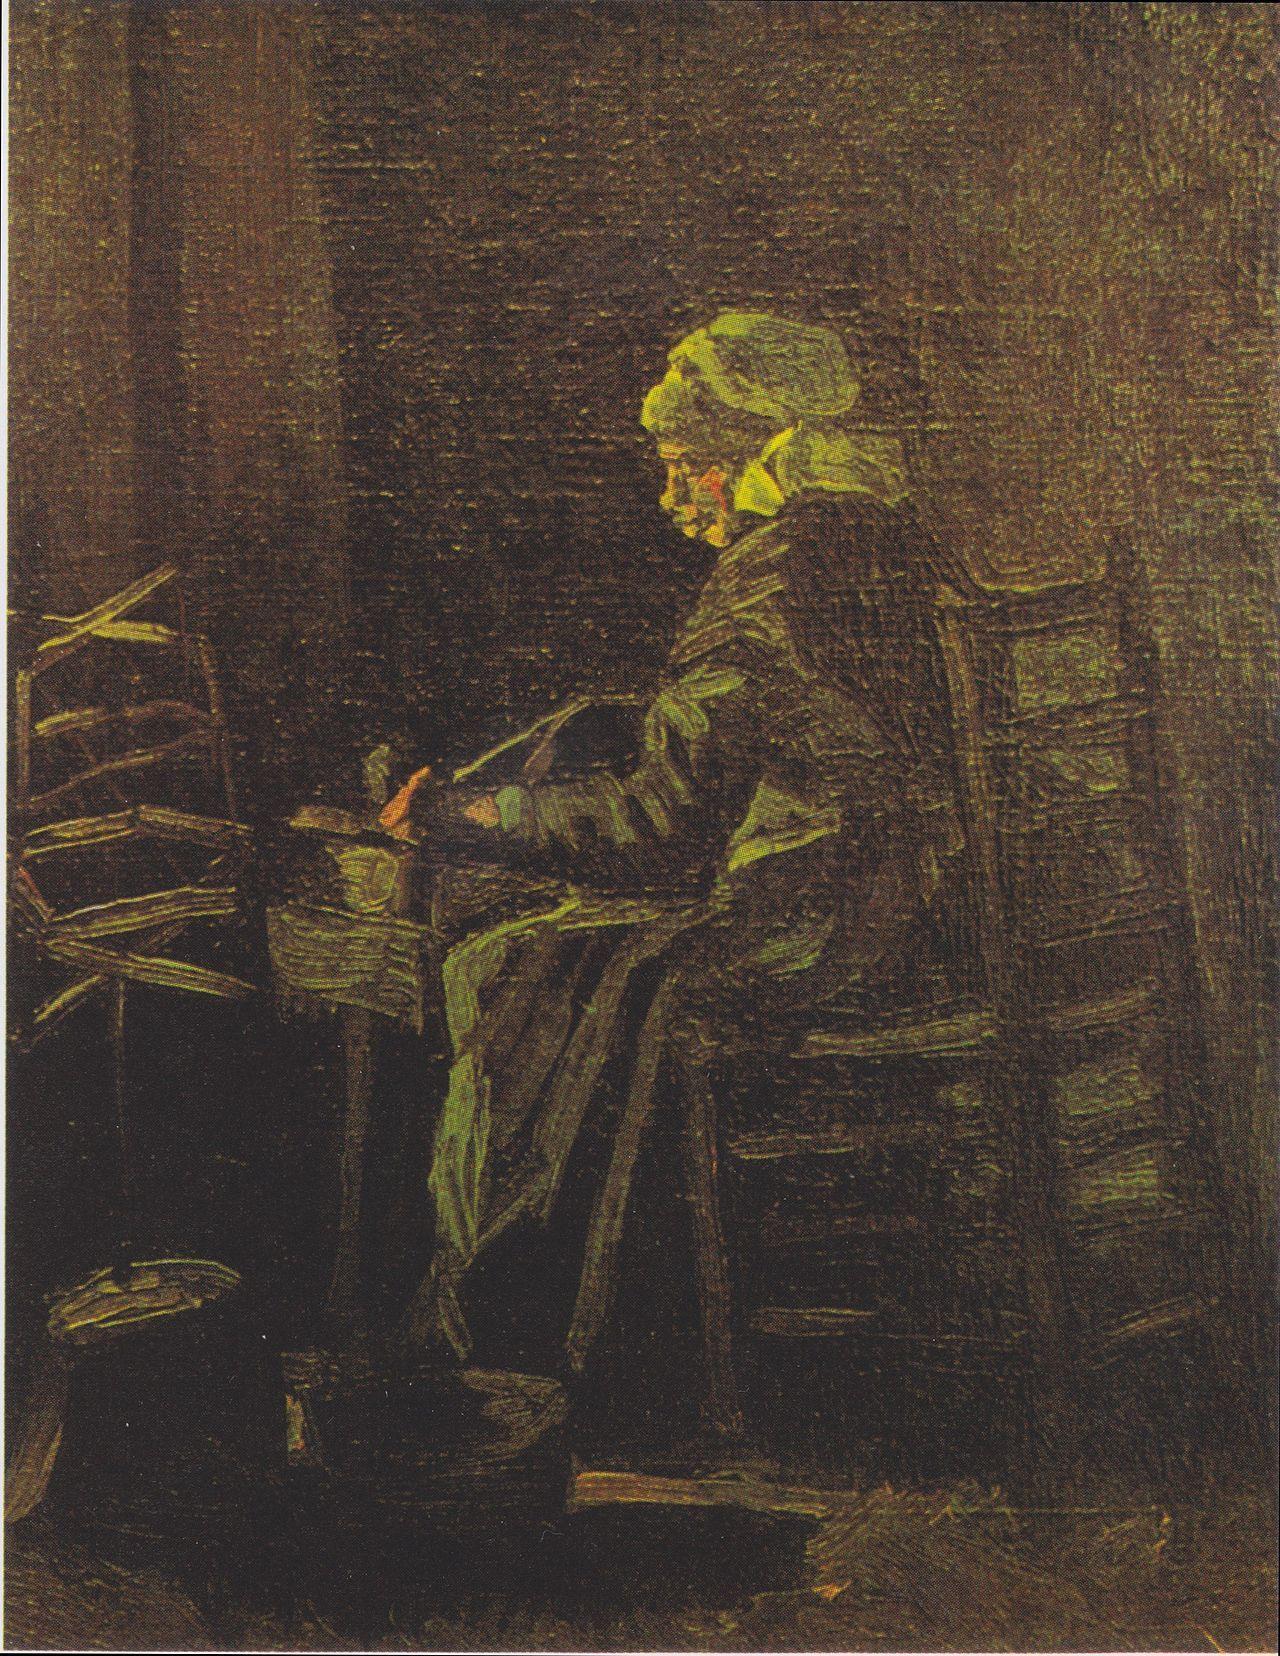 Van Gogh works by date - Wikimedia Commons | Vincent van Gogh ...